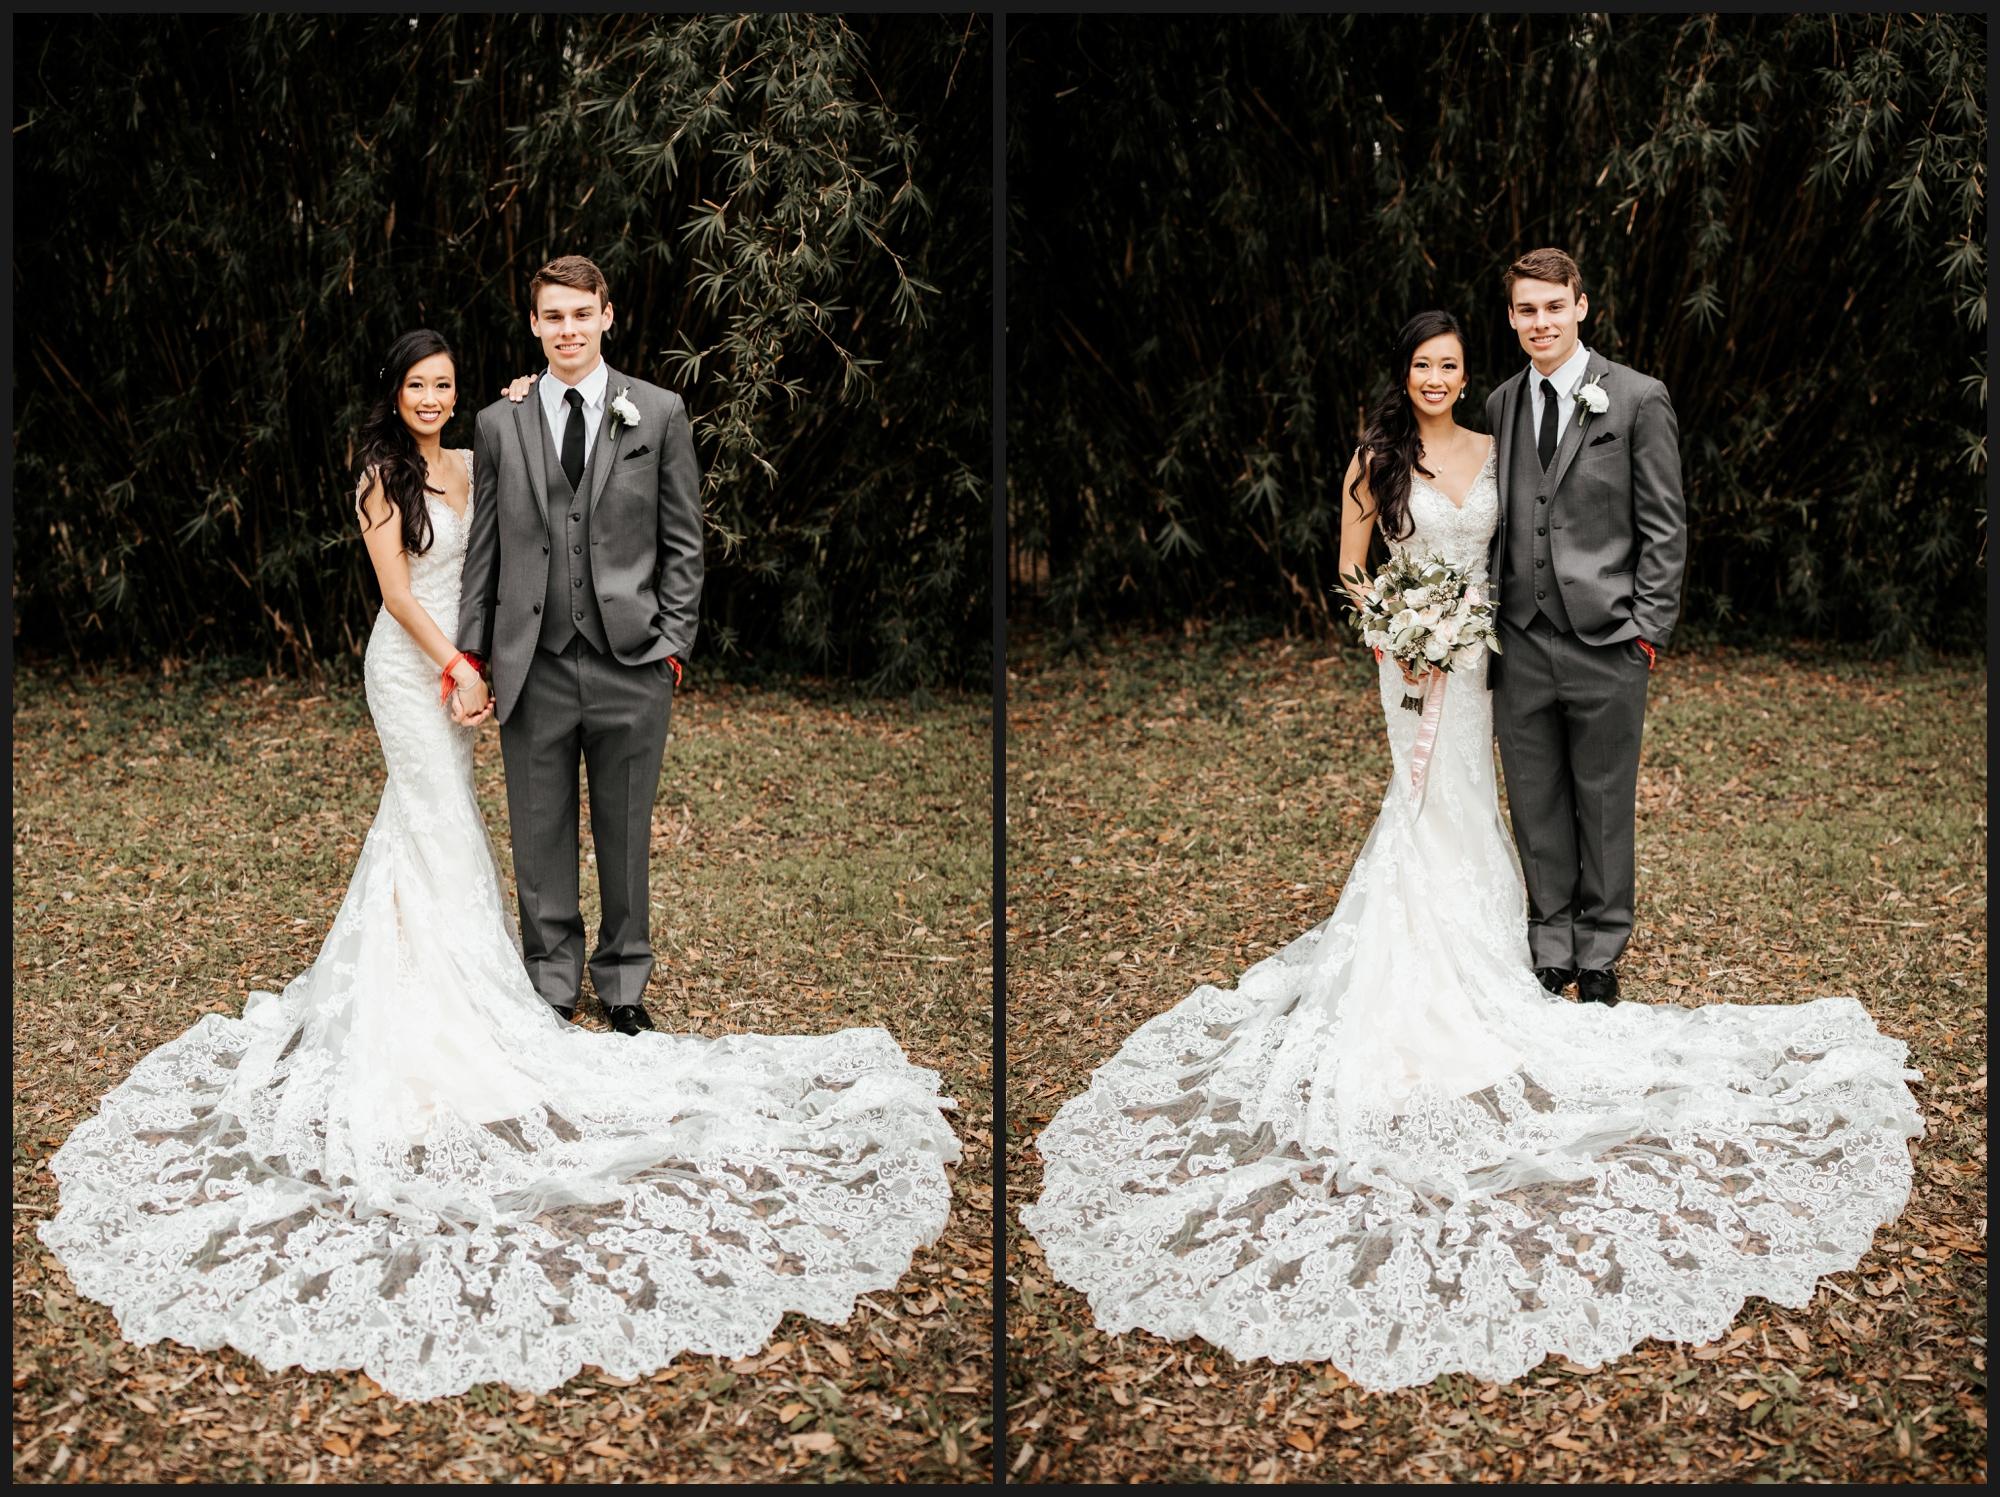 Orlando-Wedding-Photographer-destination-wedding-photographer-florida-wedding-photographer-bohemian-wedding-photographer_1355.jpg